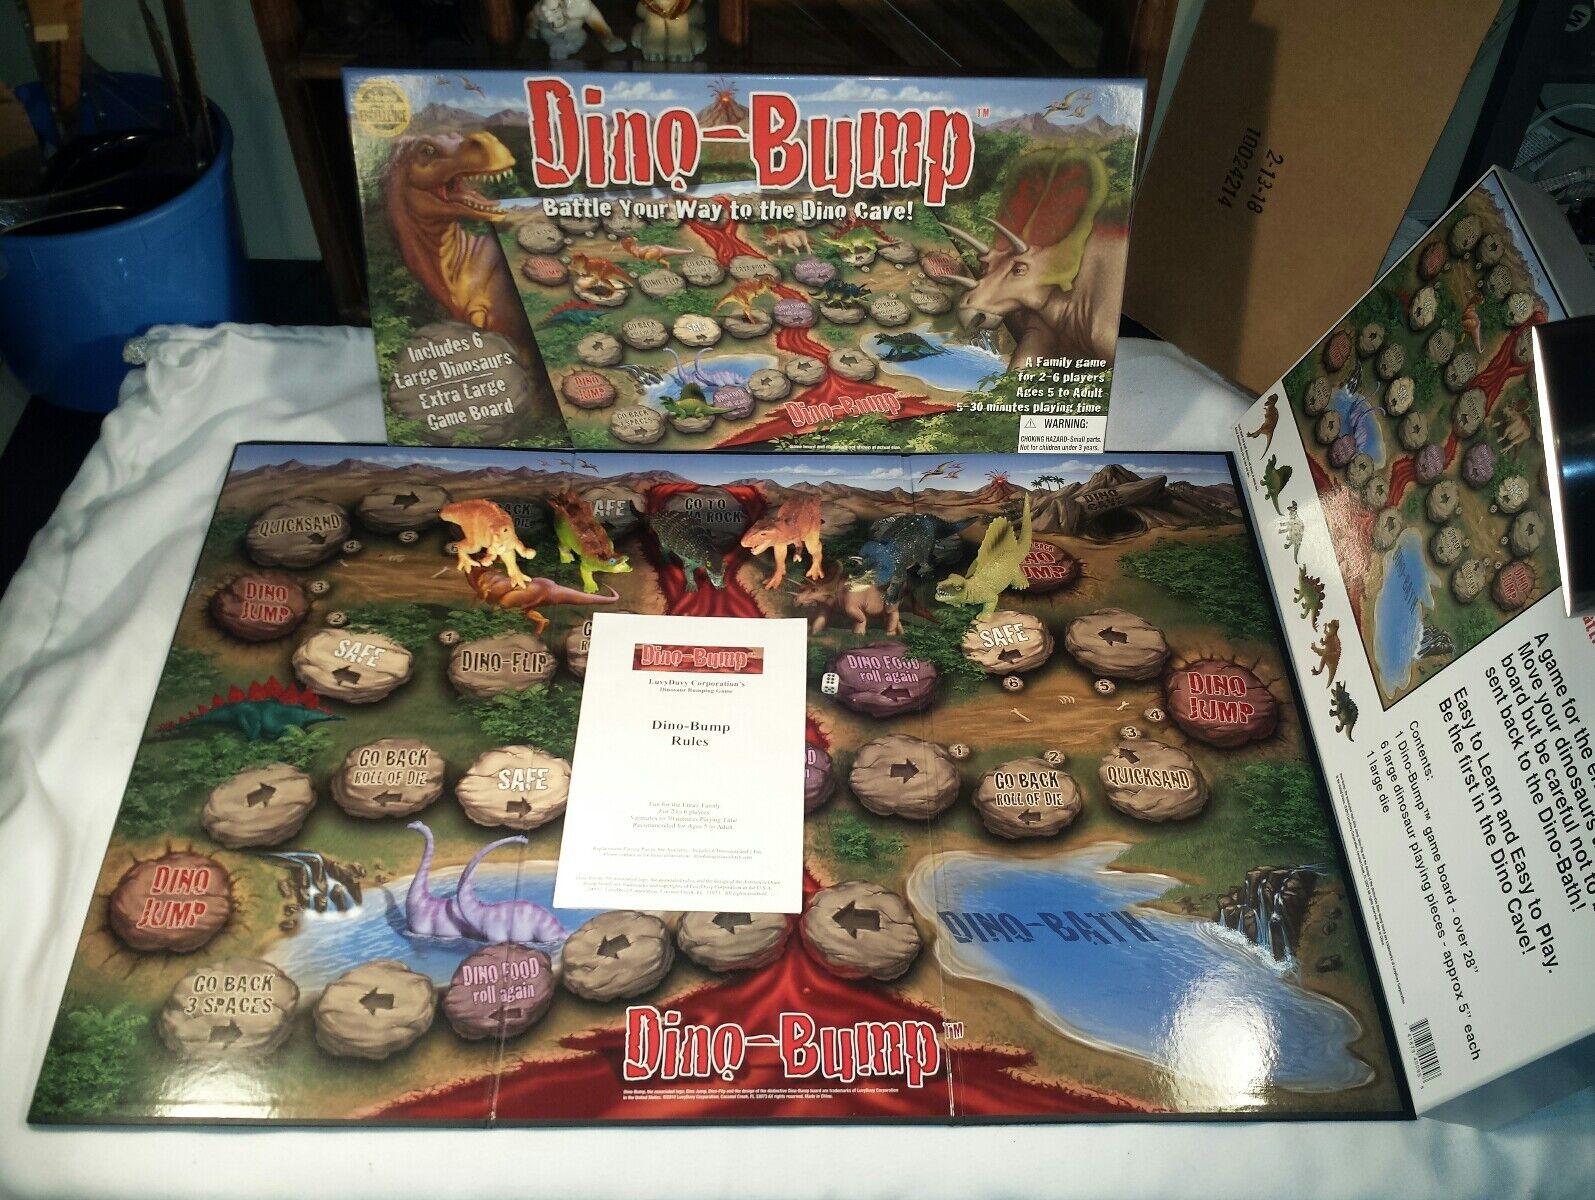 DINO-BUMP Award Winning Dinosaur Board Game 2009 COMPLETE & RARE